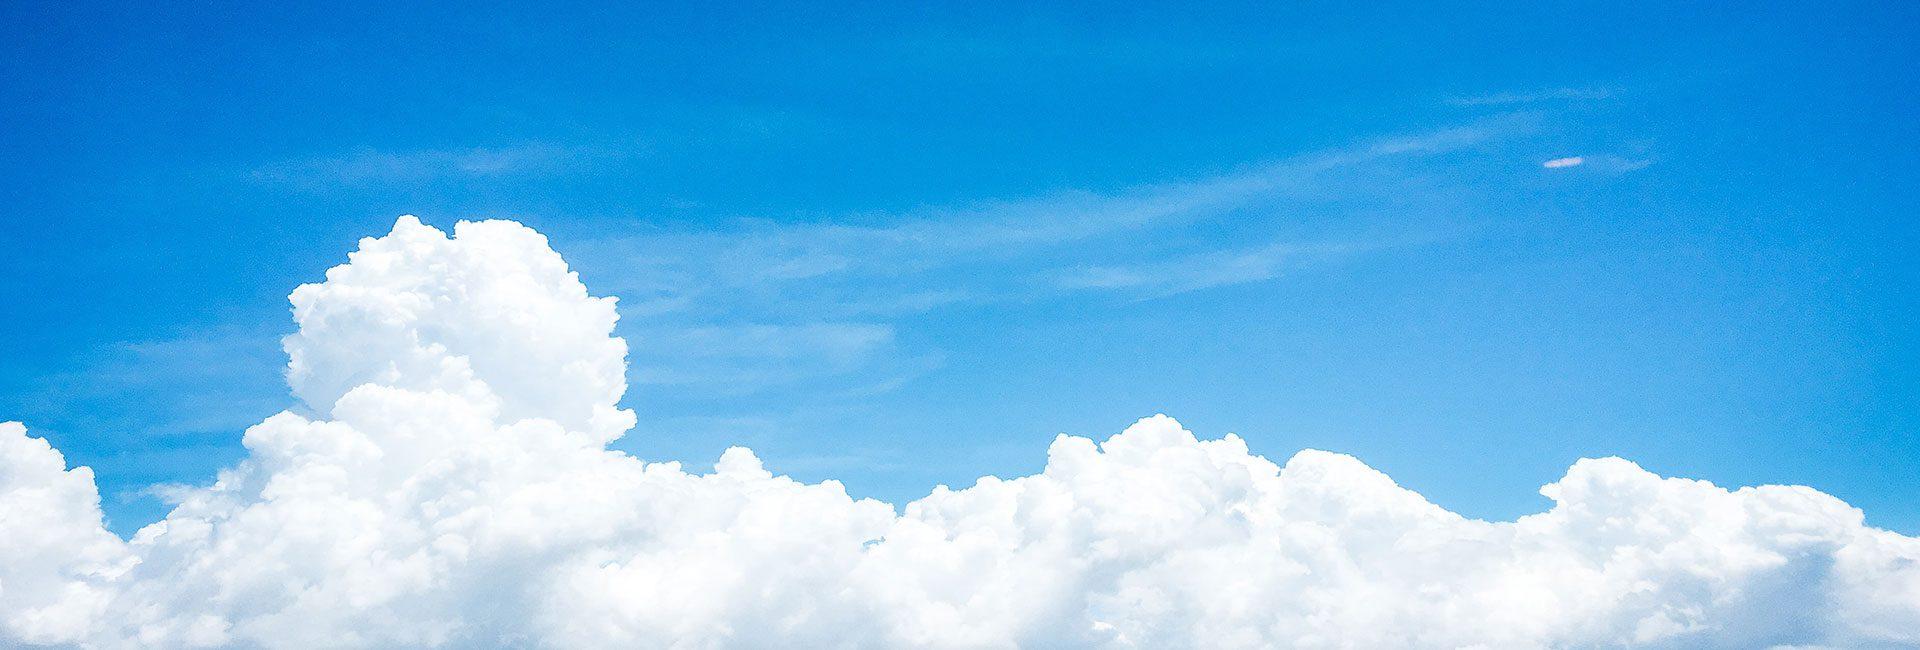 airfrance-couverture-1920x650px